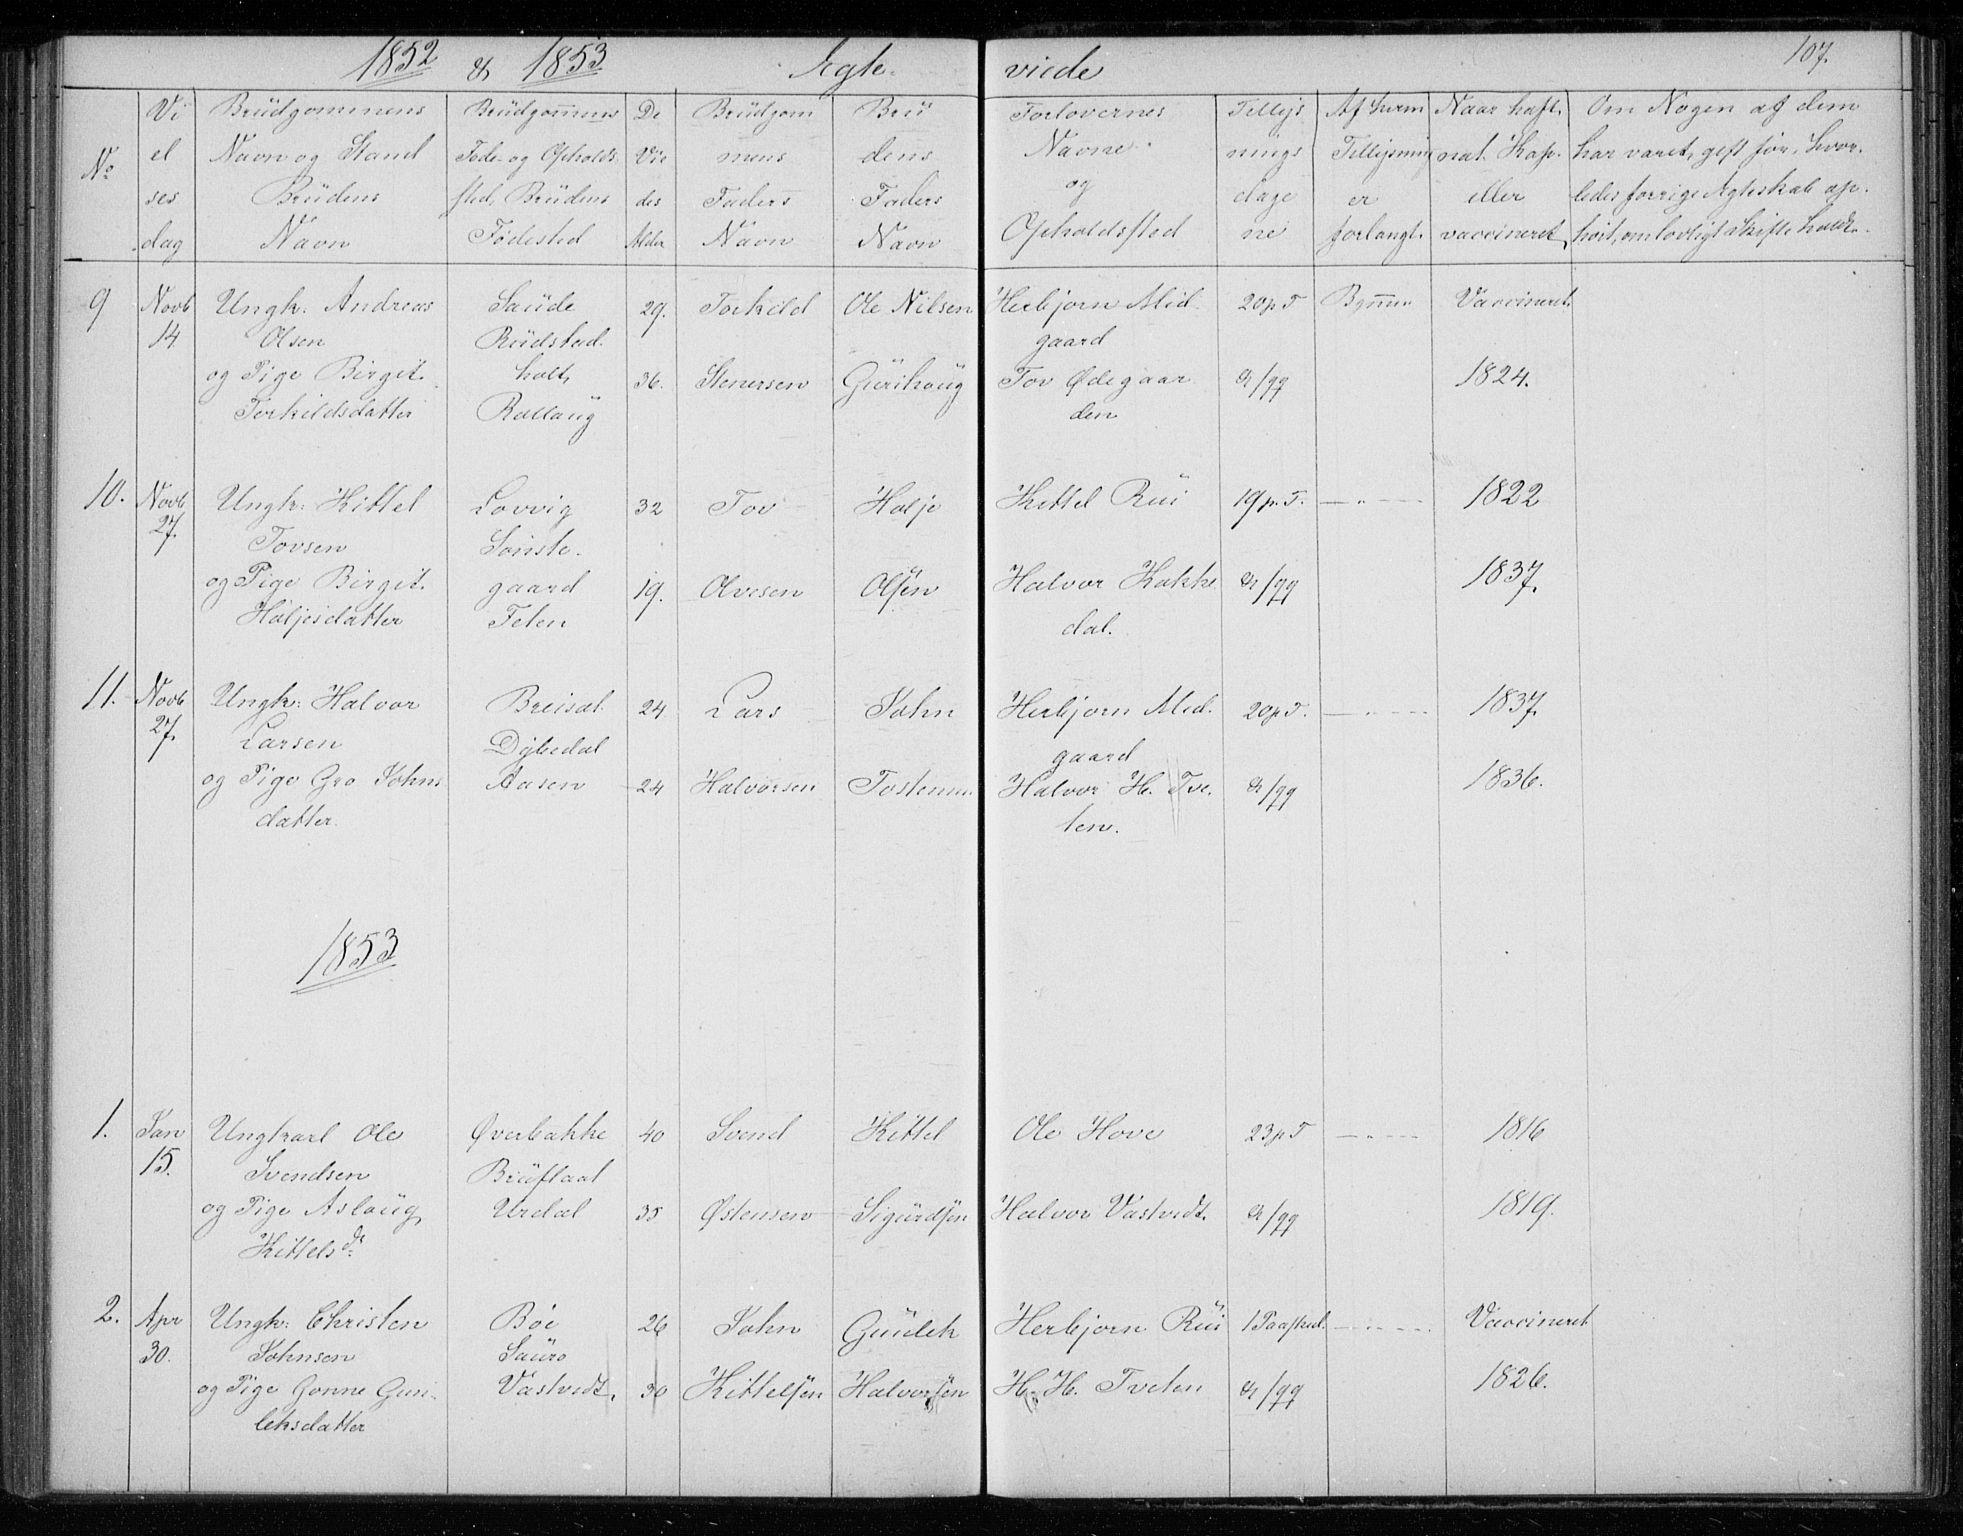 SAKO, Gransherad kirkebøker, F/Fb/L0003: Ministerialbok nr. II 3, 1844-1859, s. 107